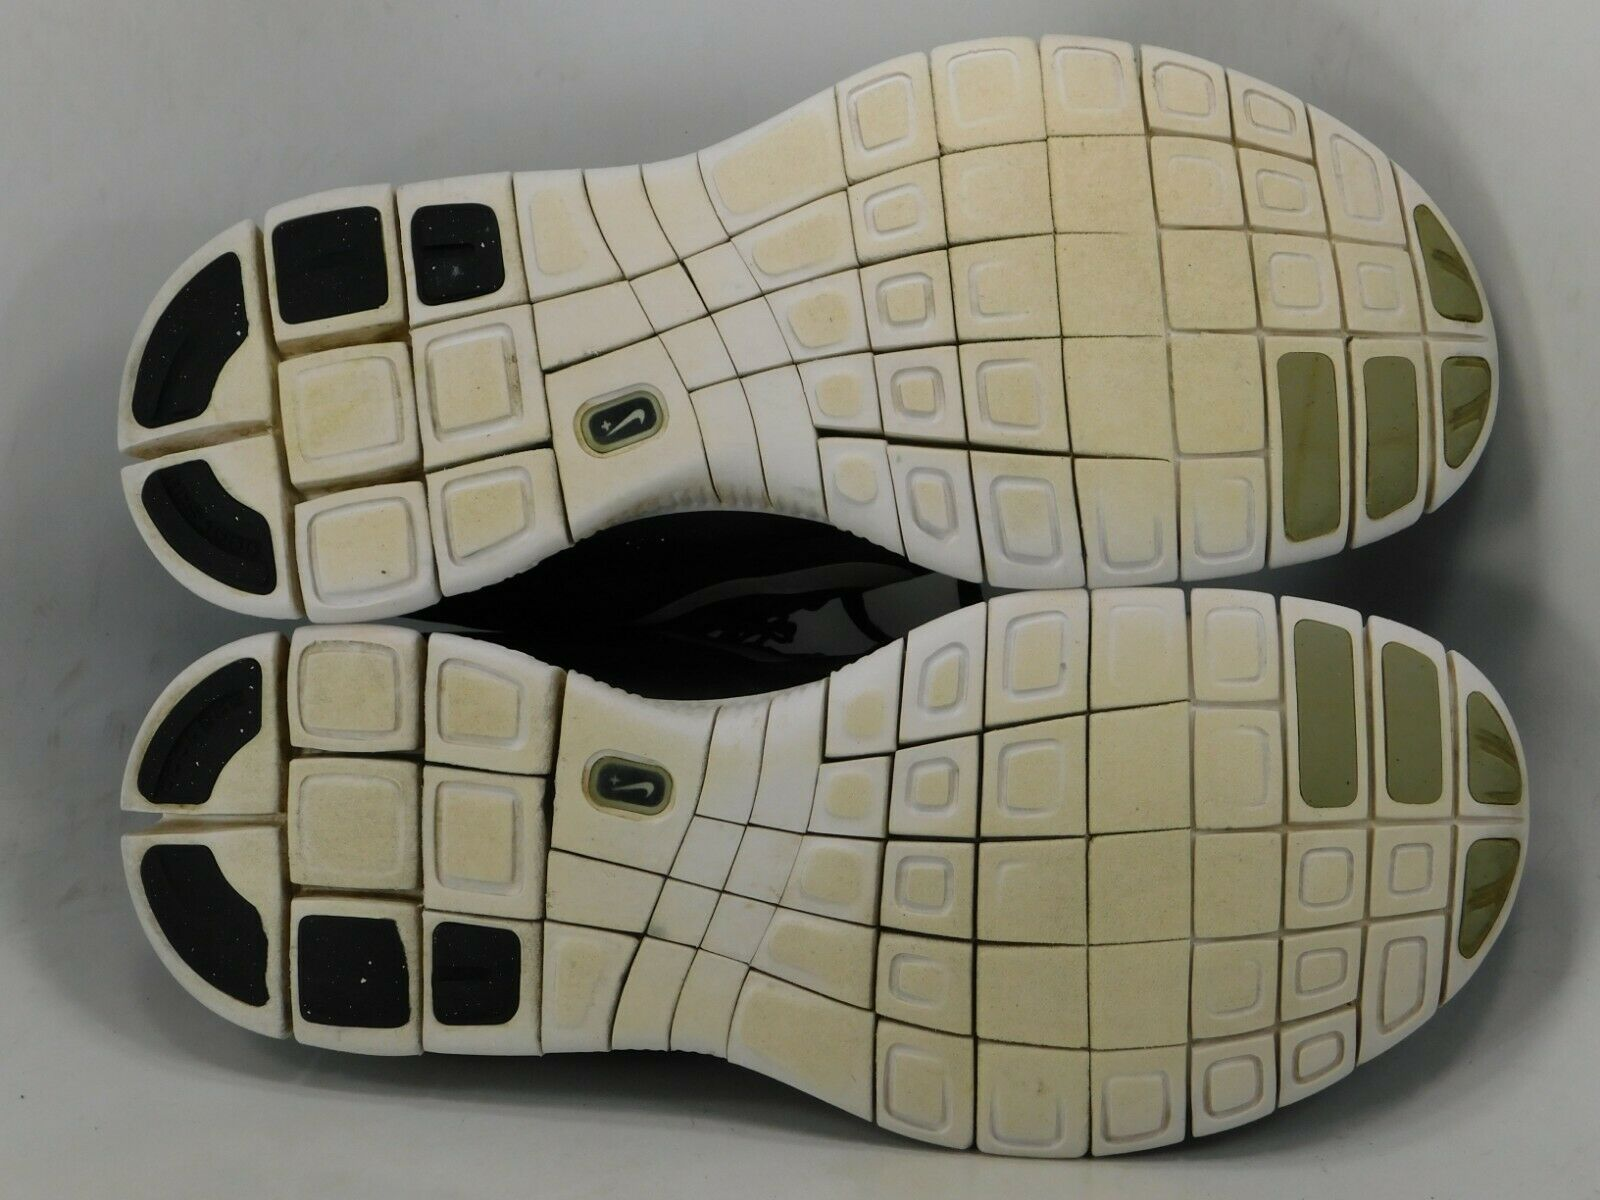 Nike Free 5.0+ Size US 9.5 M (D) EU 41 Women's Running Shoes Black 580591-002 image 7